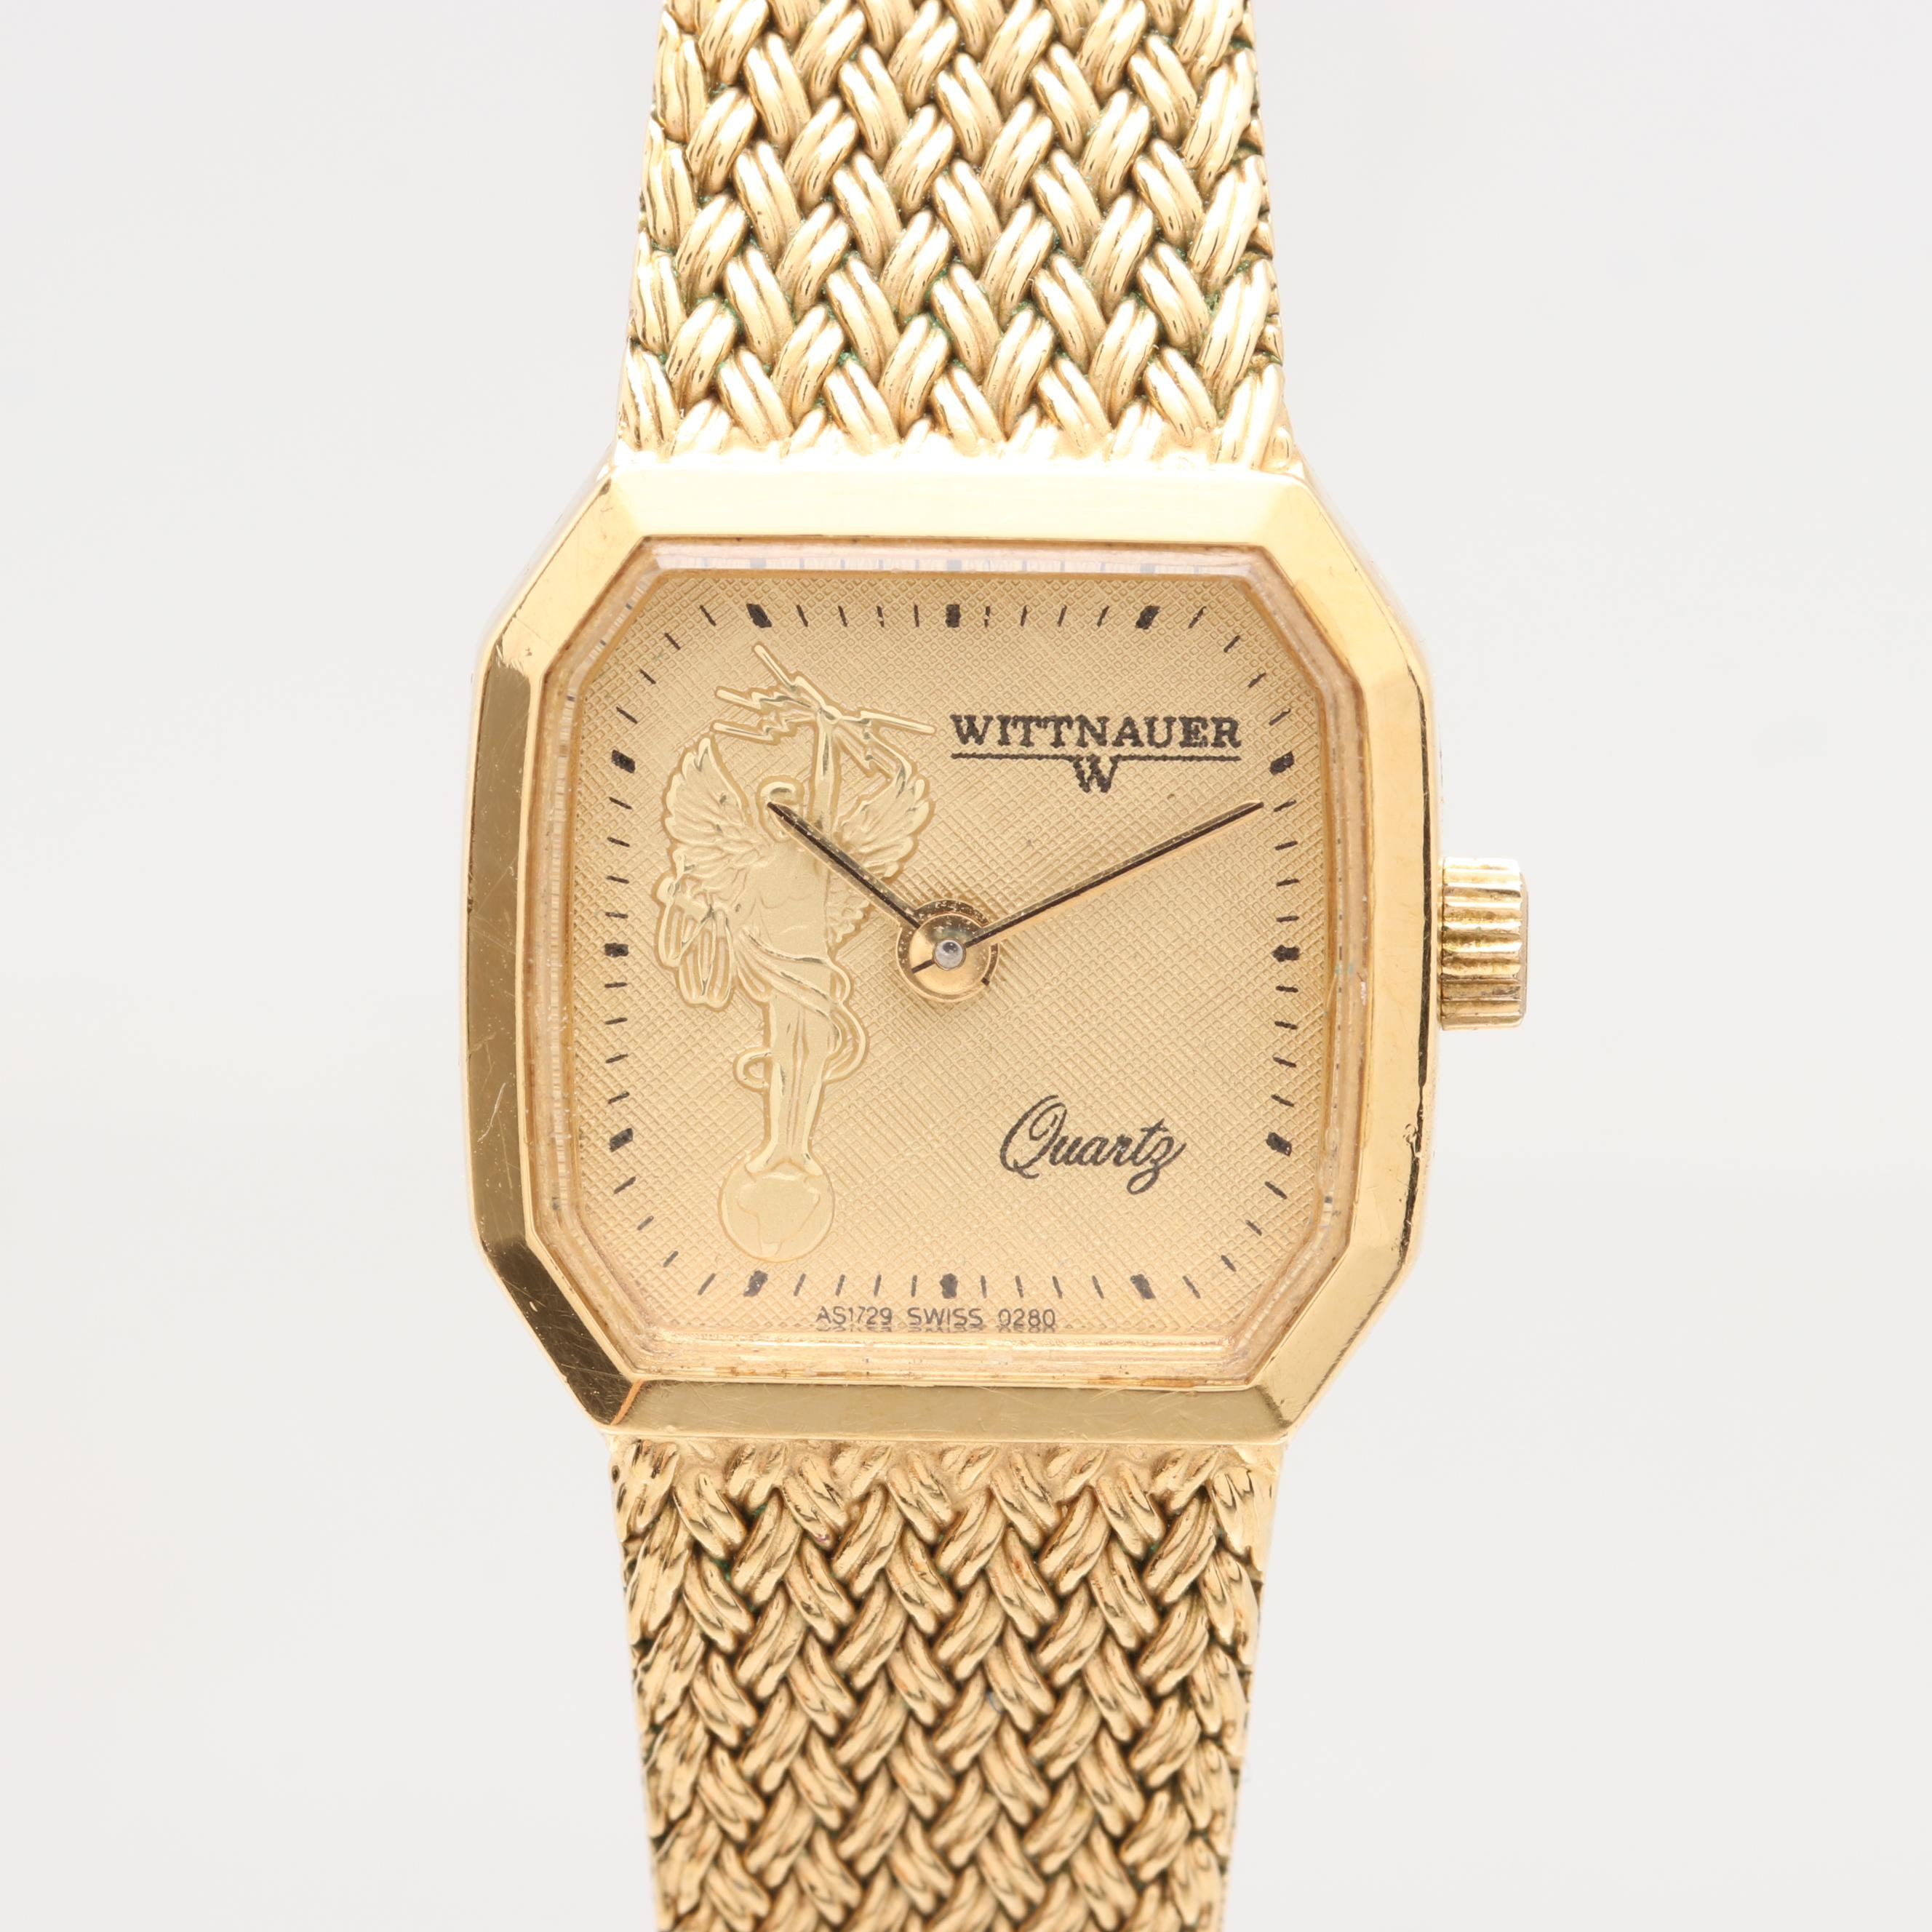 Wittnauer Gold Tone Analog Wristwatch